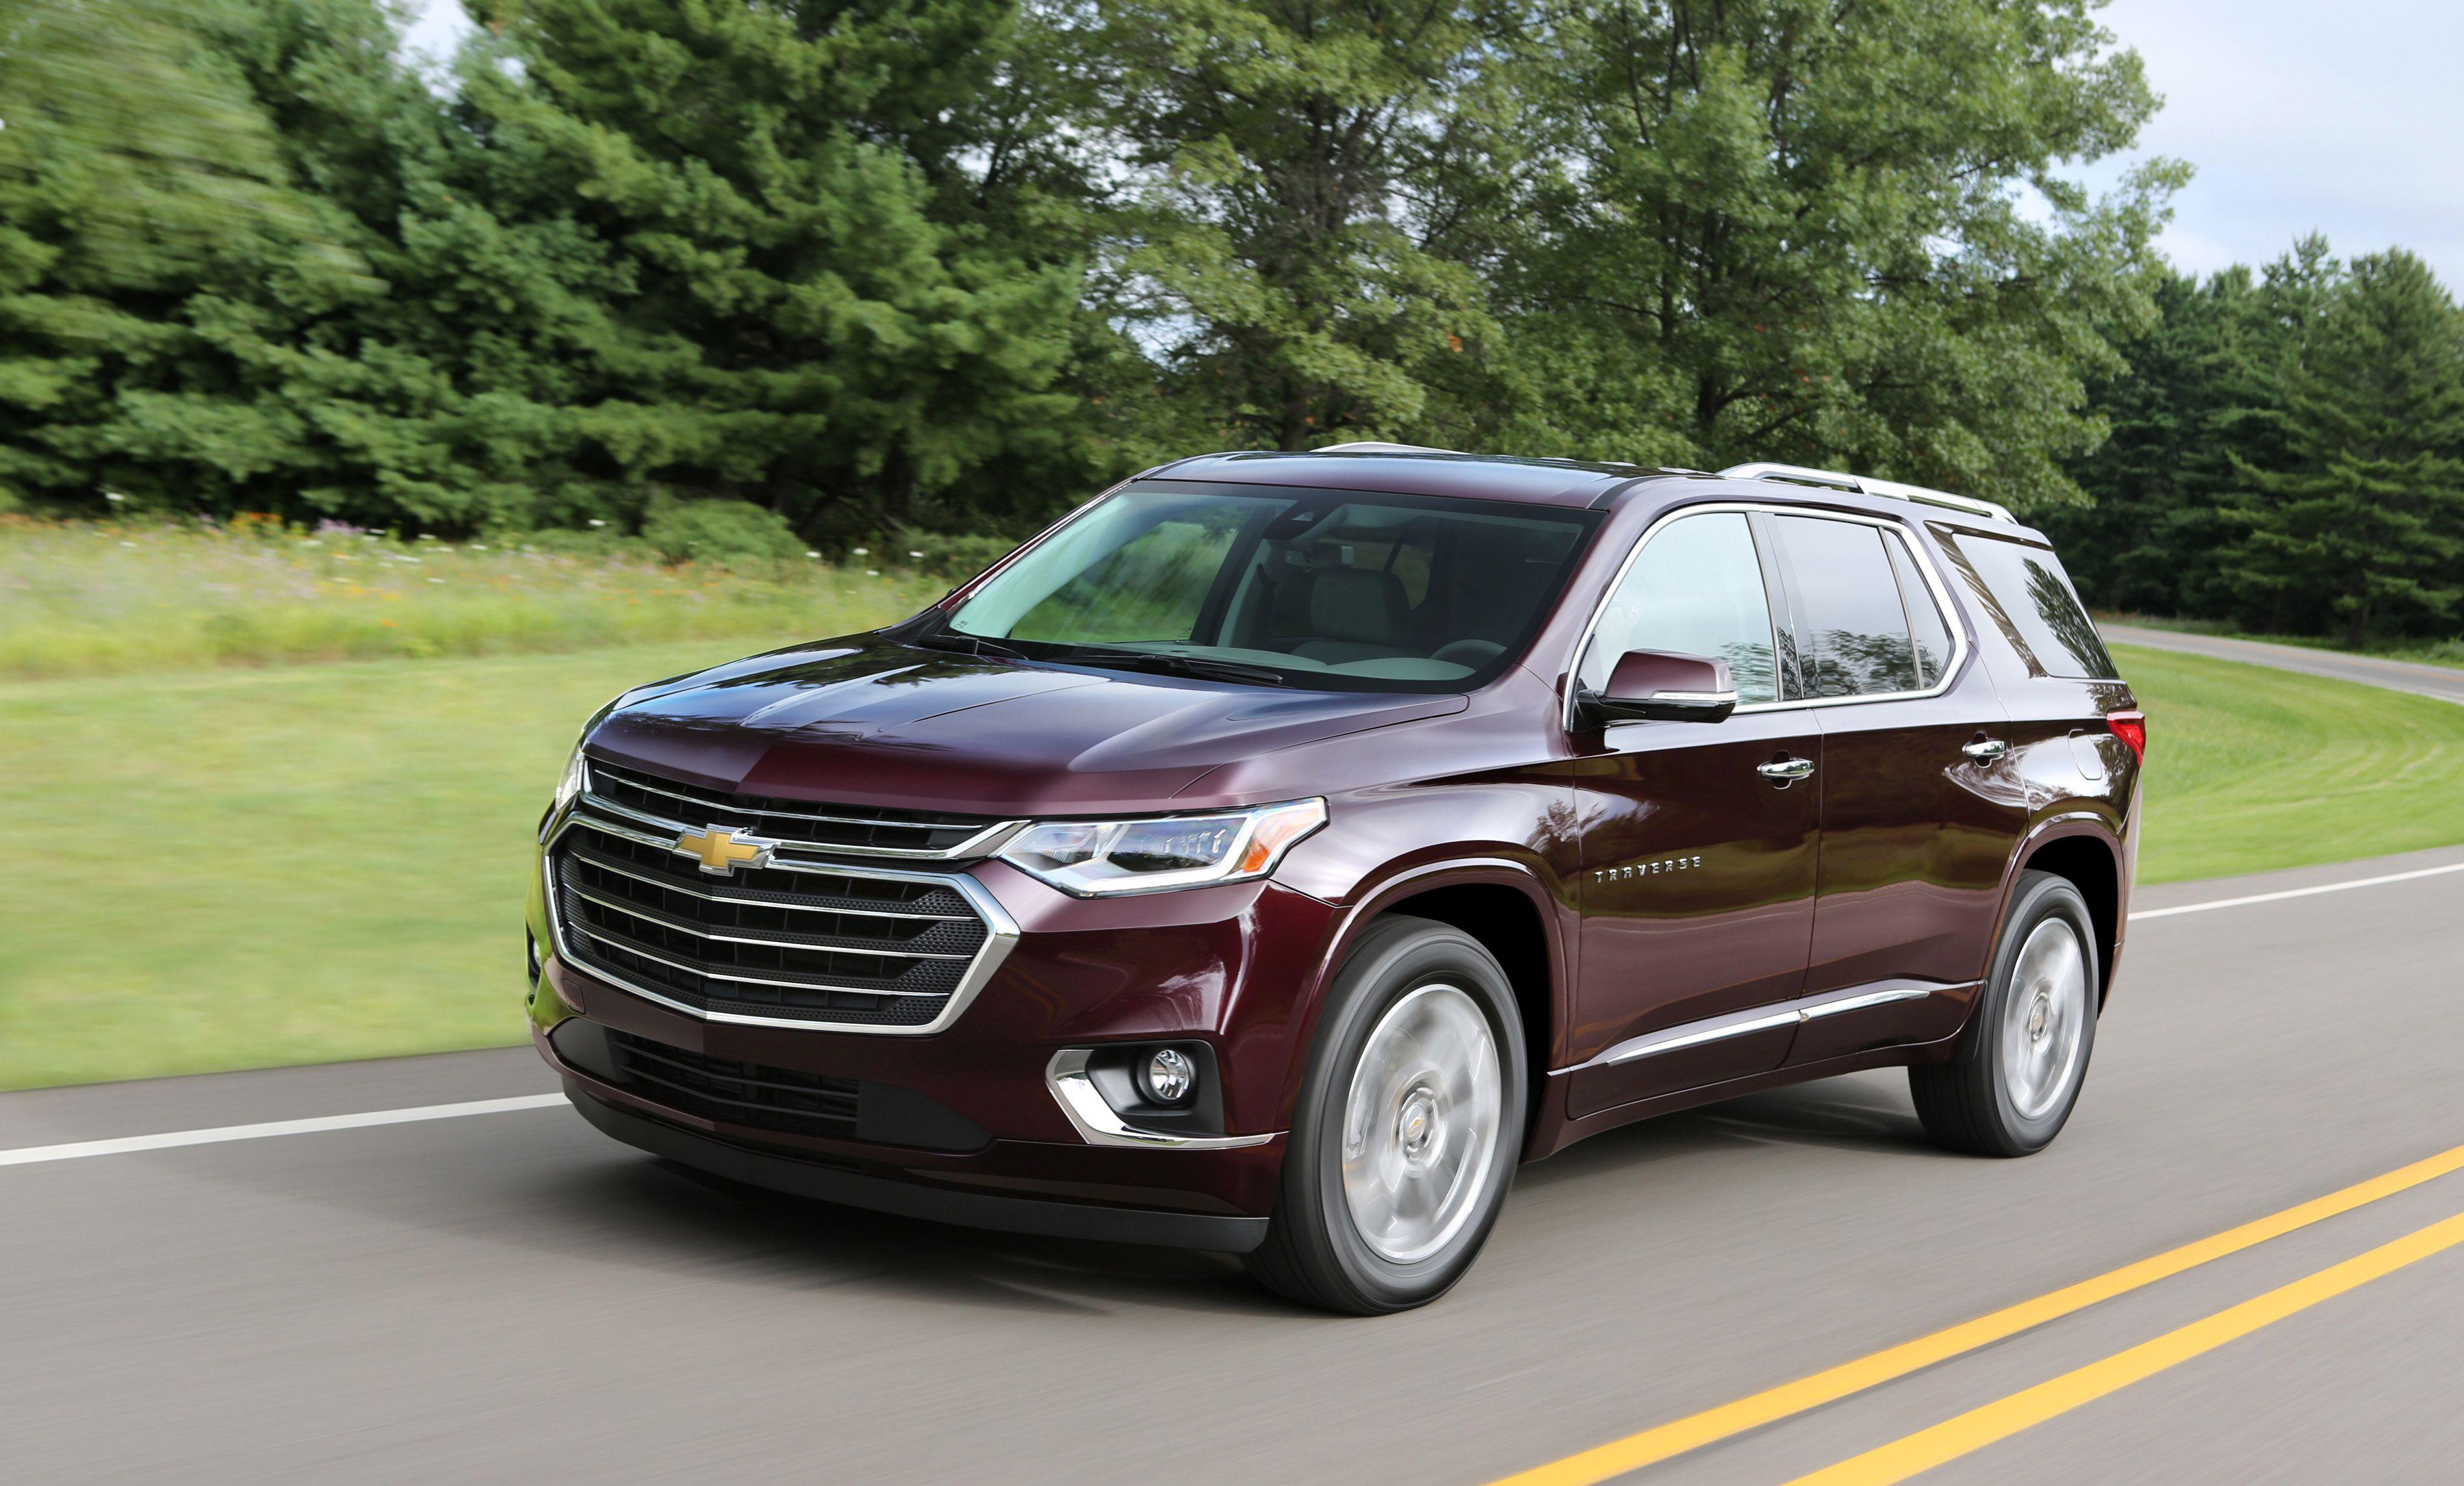 2018 Chevrolet Traverse For Sale Near Newark De Jeff Dambrosio Wiring Diagram Chevy Trax Cruise Control